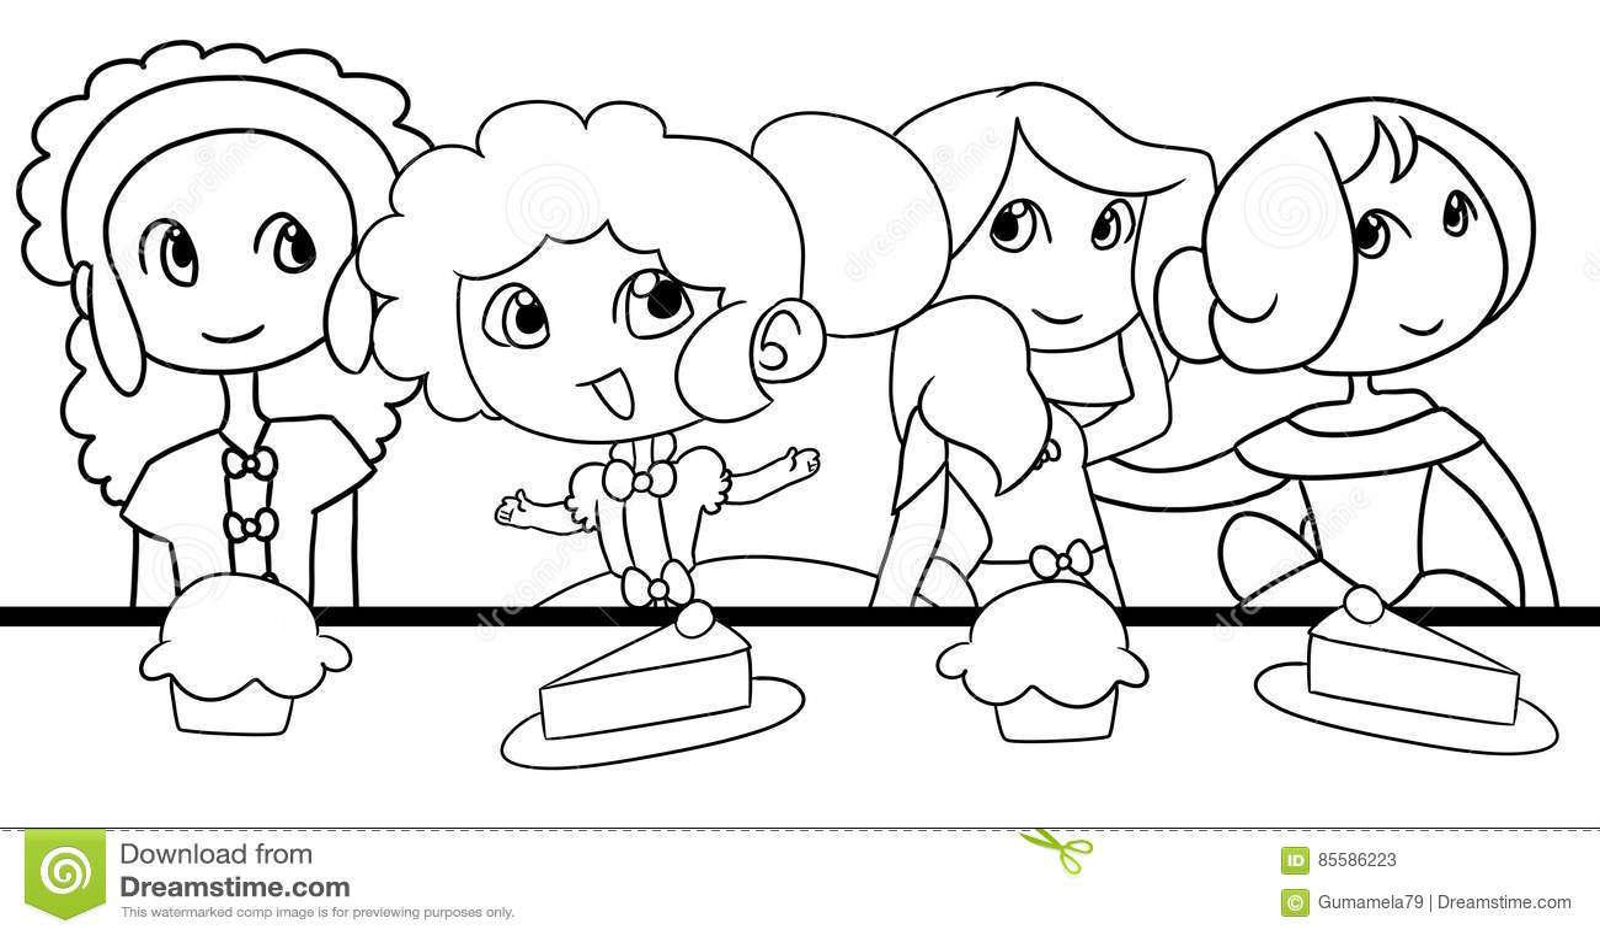 Two Princesses Having Tea Coloring Sheet Royalty Free Cartoon